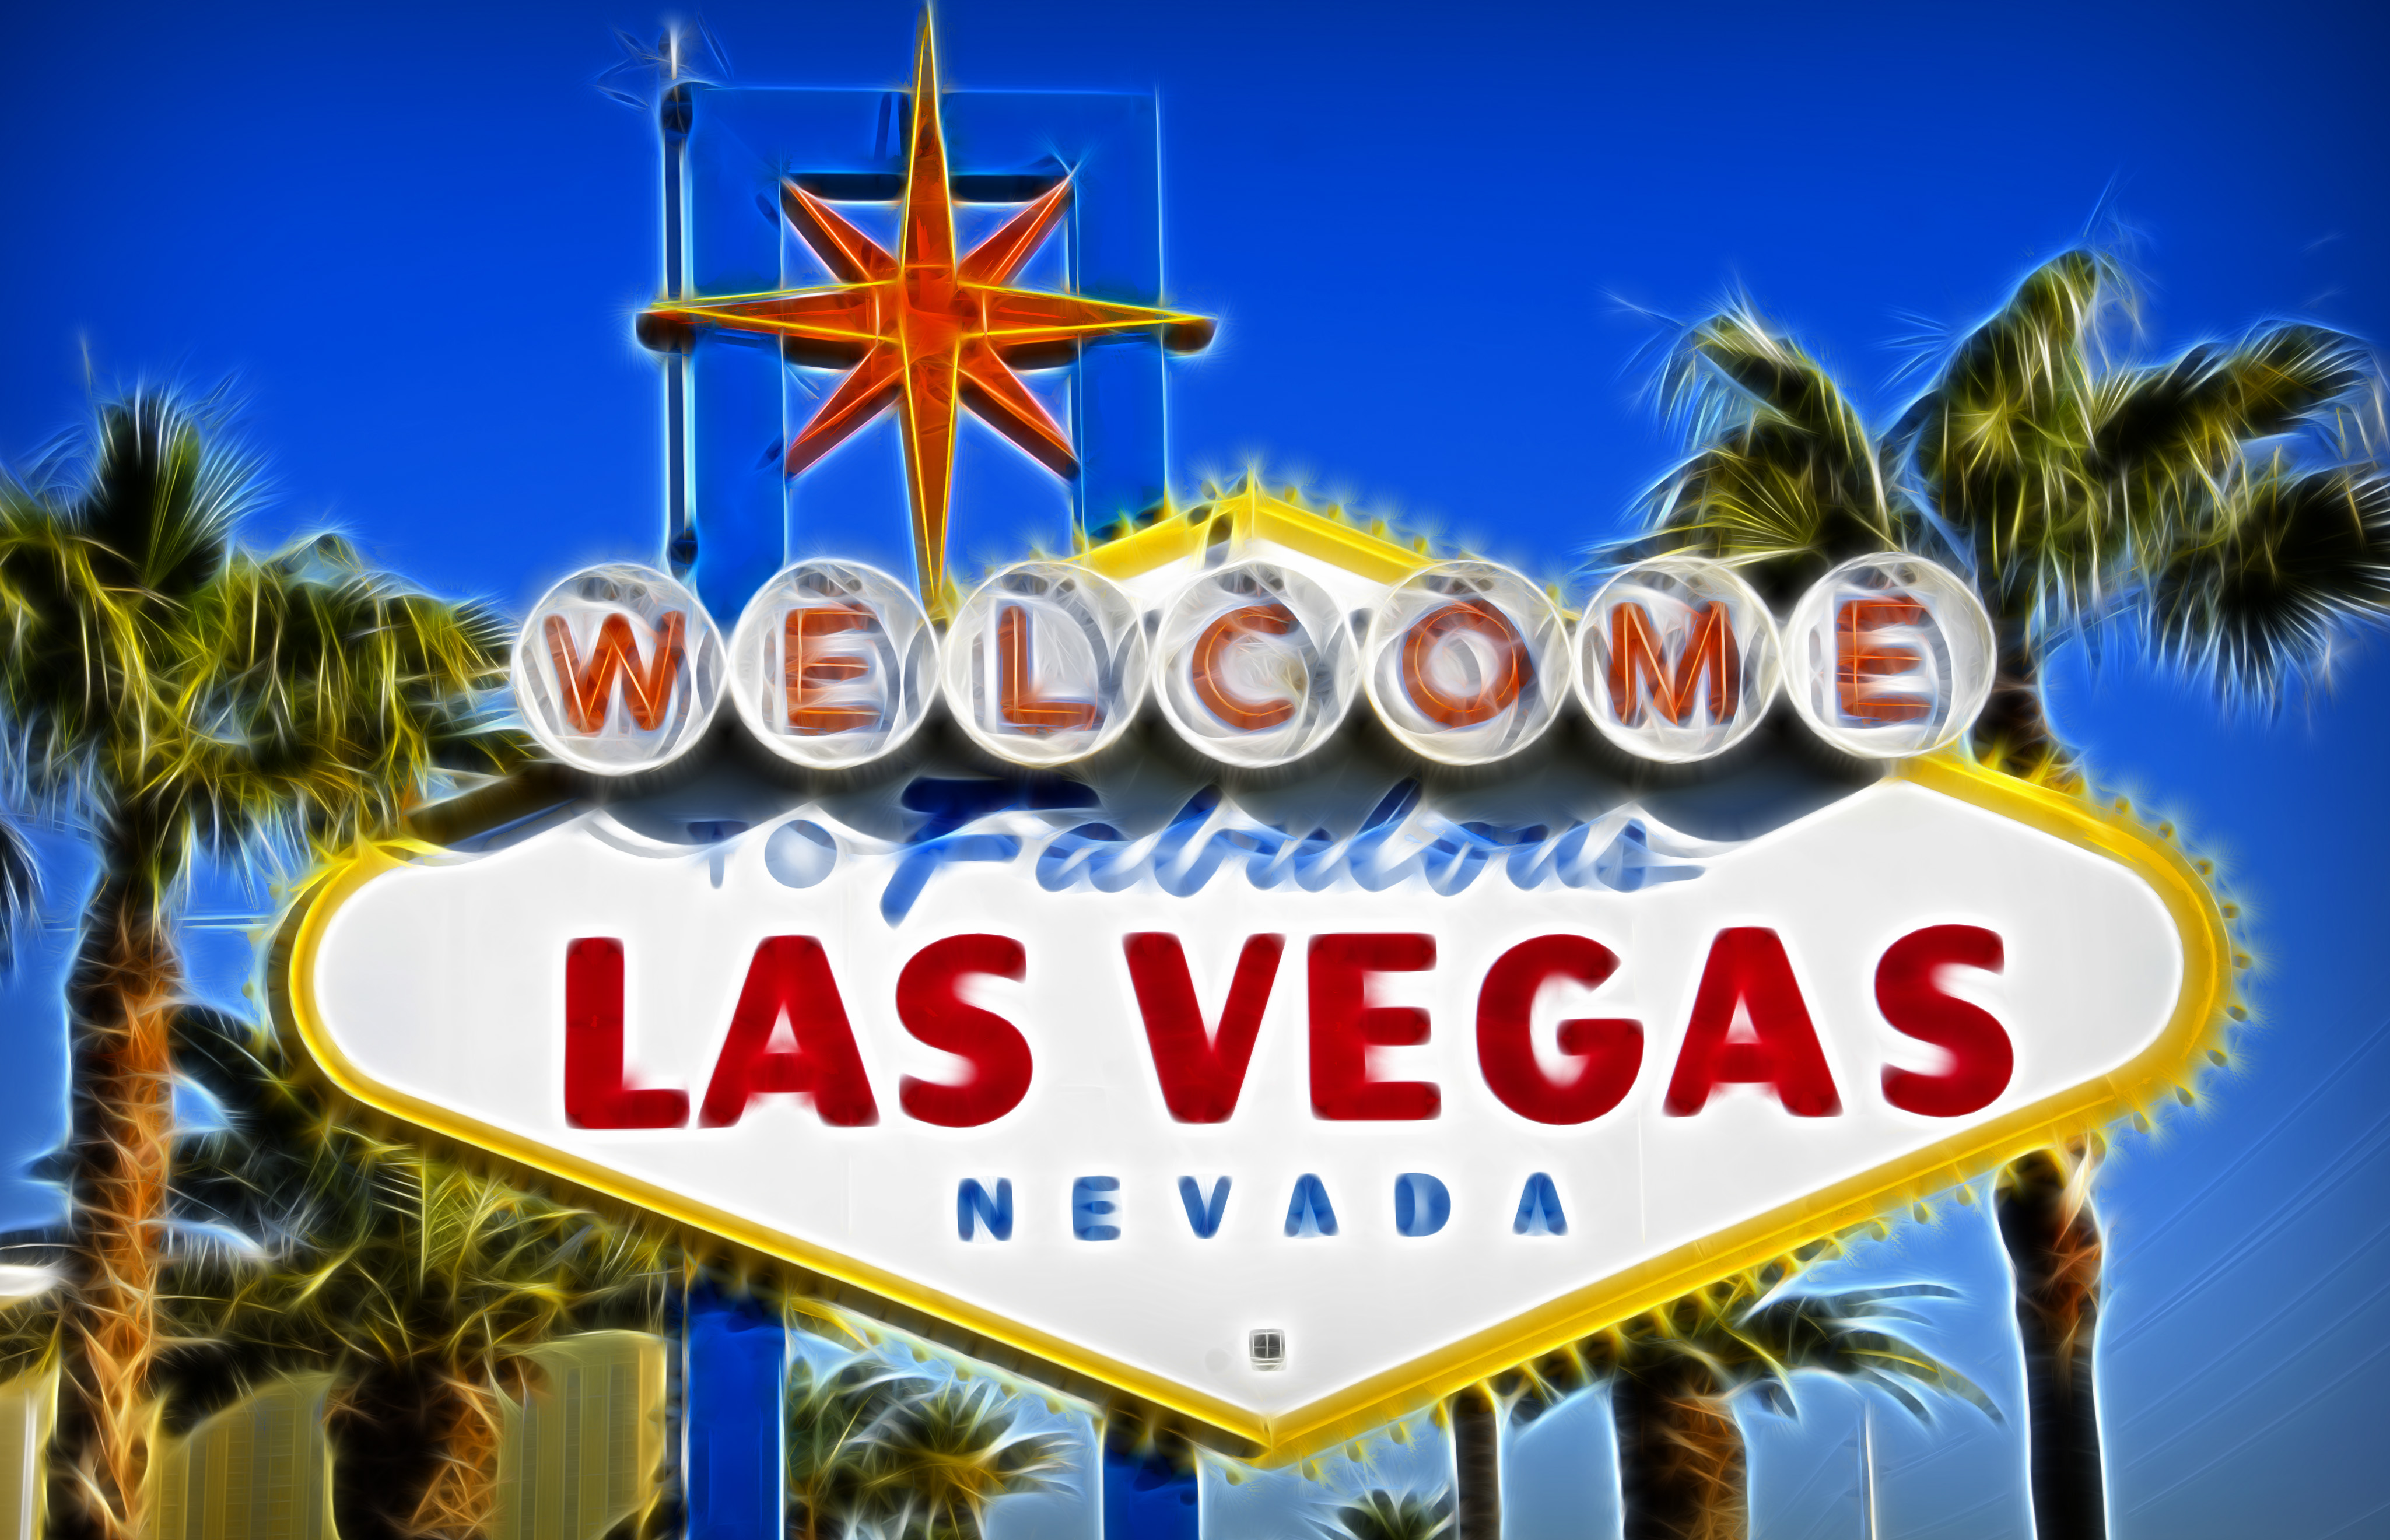 Download Las Vegas Sign Wallpaper Gallery